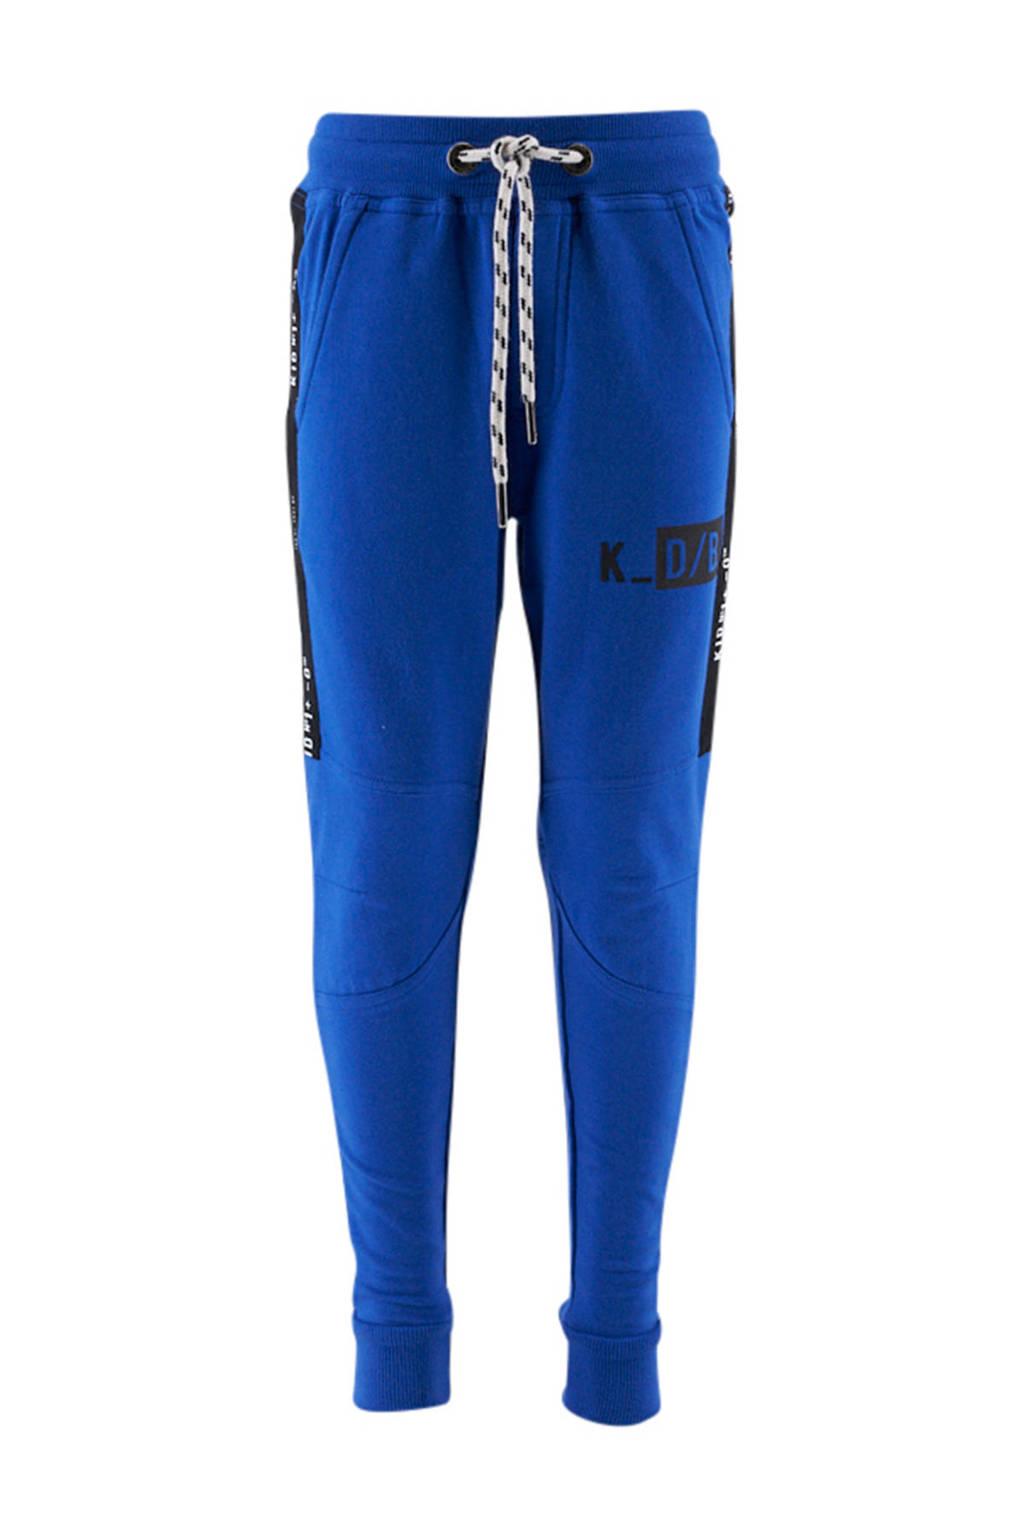 KIDDO sweatpants blauw, Blauw